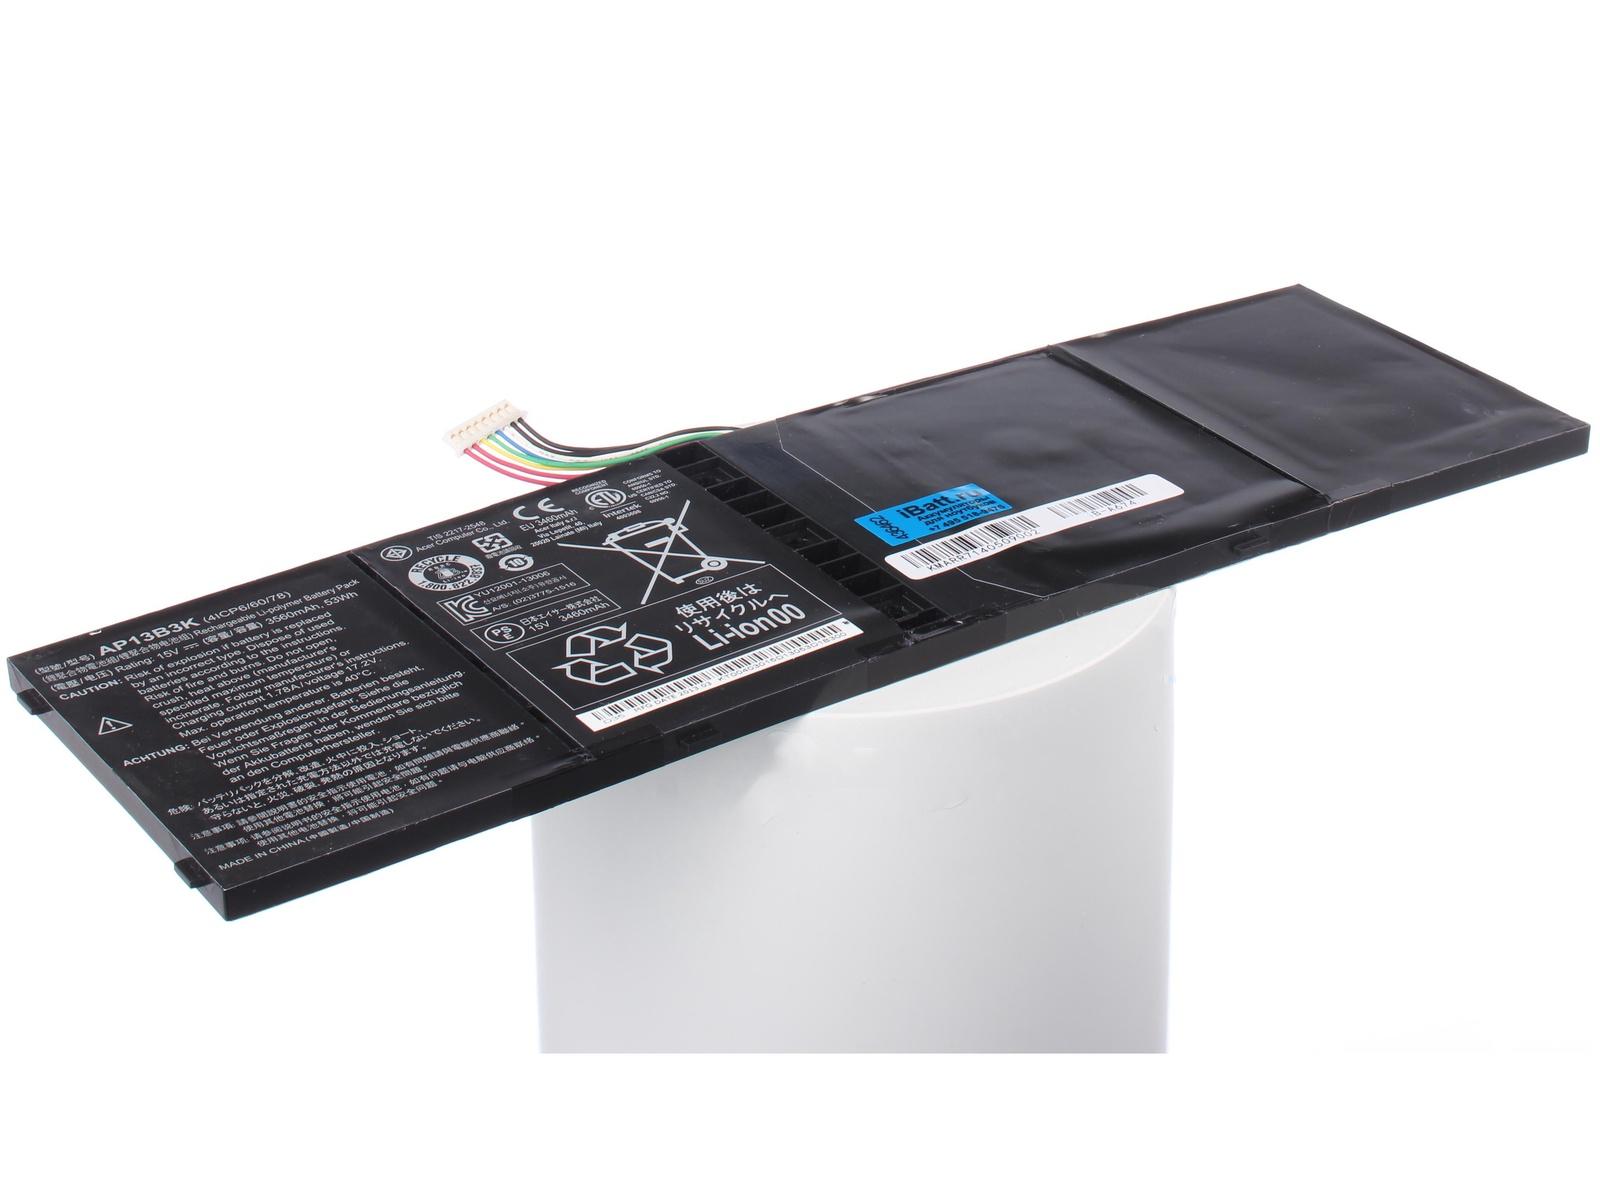 Аккумулятор для ноутбука iBatt для Acer Aspire V5-572G-73536G50akk, Aspire V5-572G-33226G50akk, Aspire V5-572G-53336G50aii, Aspire R3-471TG-555B, Aspire V5-552G-85556G50akk, Aspire V5-552G-10578G1Takk, Aspire R7-571G-73536G75ass original 14 lcd touch screen digitizer assembly display for acer aspire r3 471 r3 471tg laptop